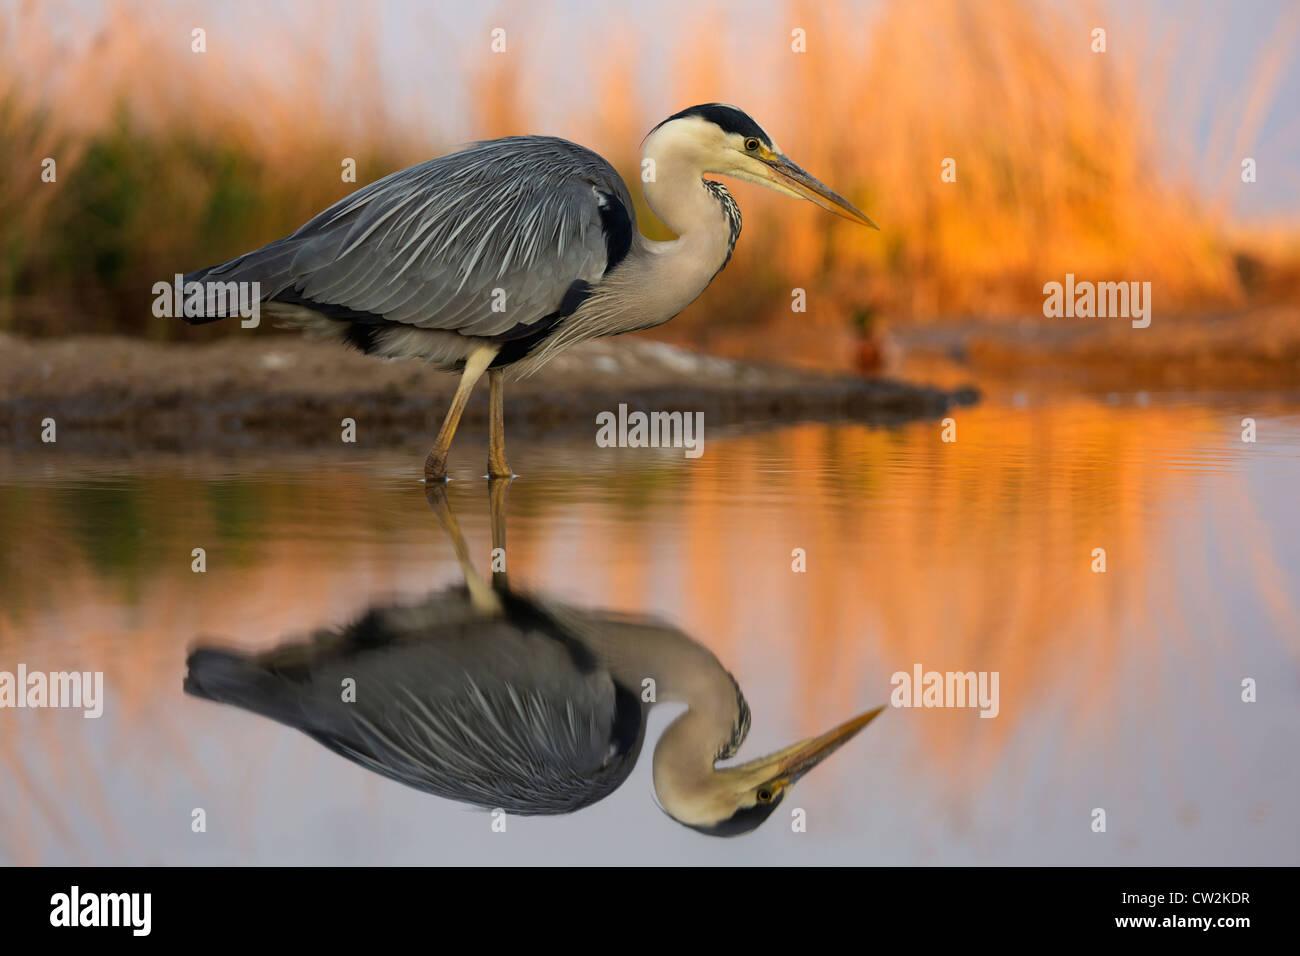 Grau Heron(Ardea cinerea) stalking Beute. Hungrige Stockbild